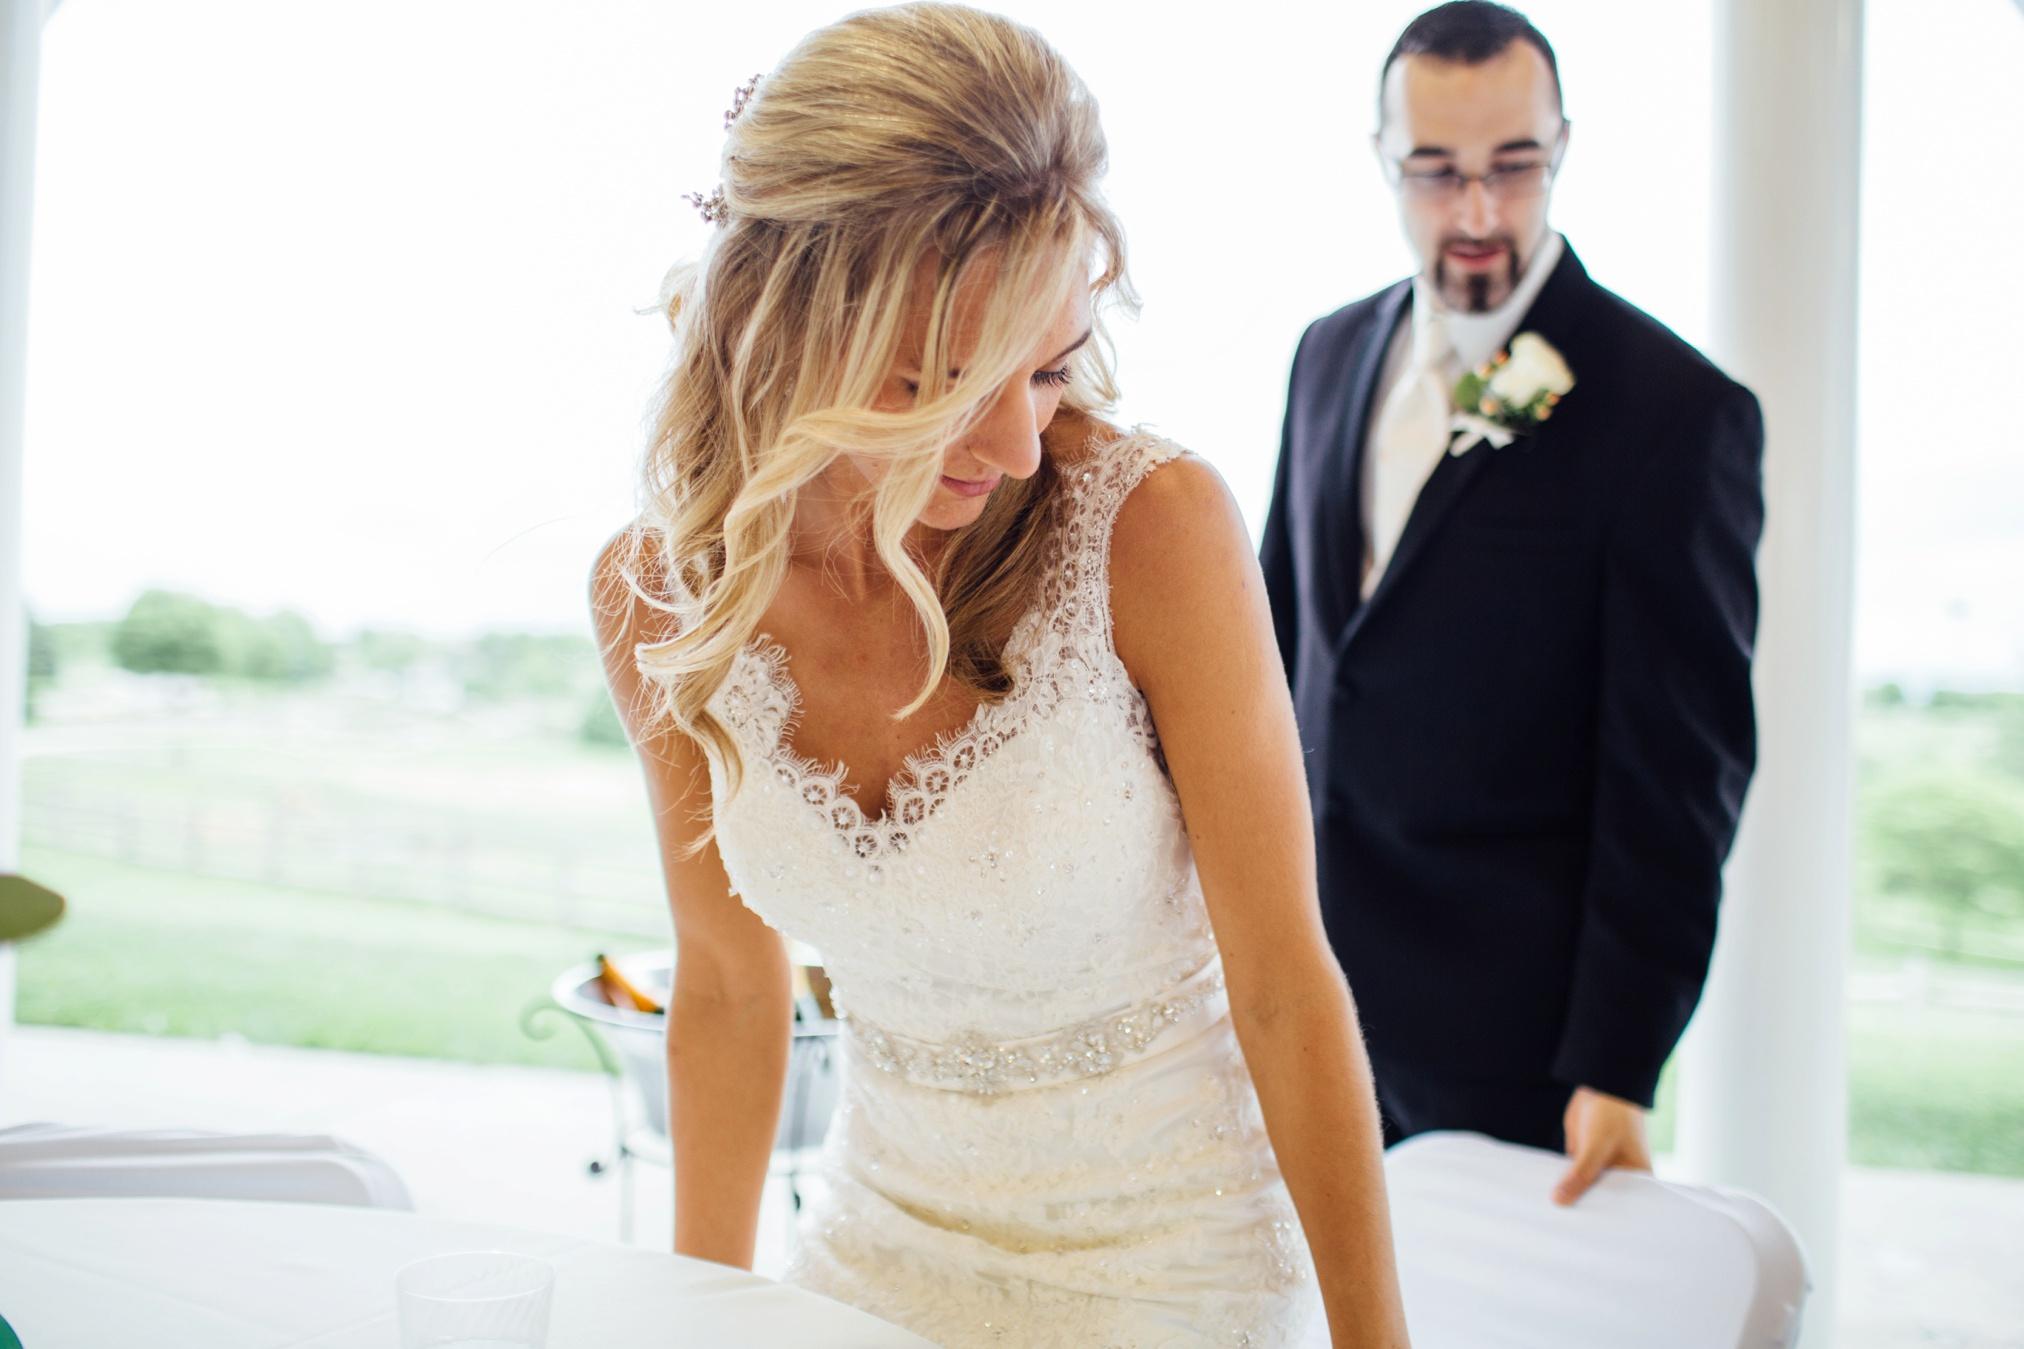 schmid_wedding-718.jpg